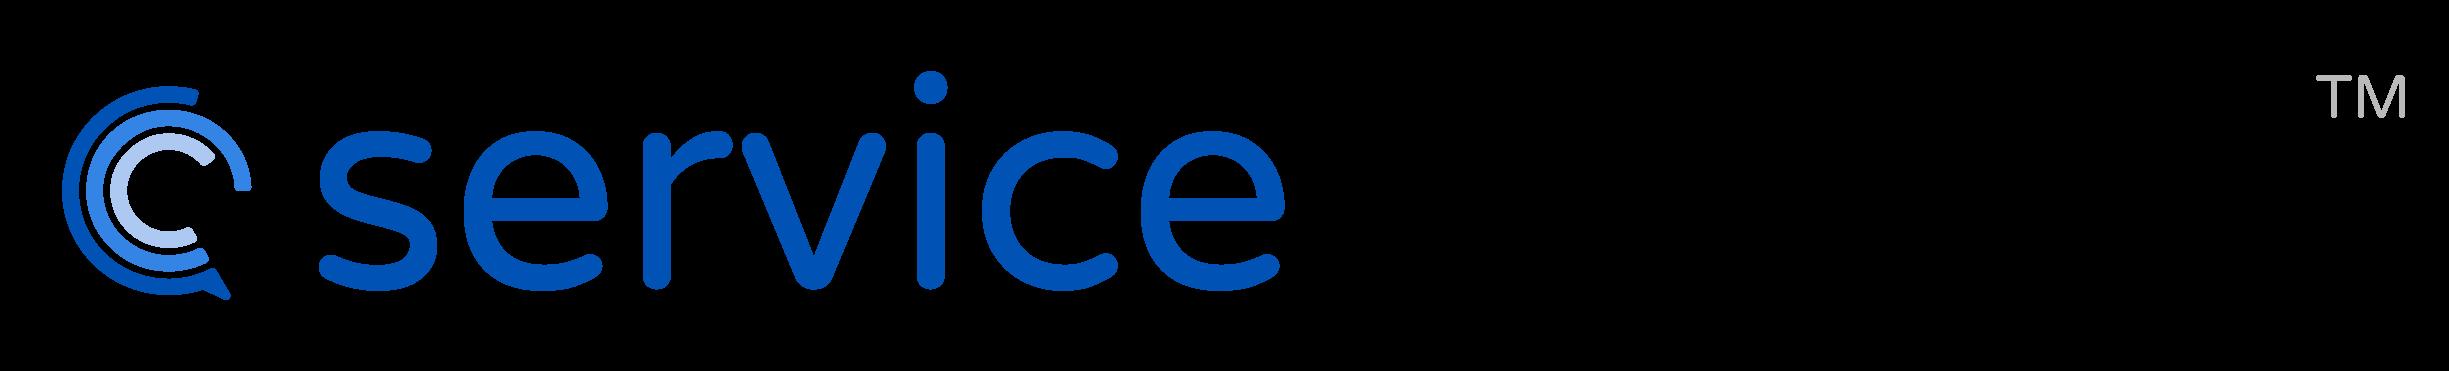 servicecoucnil-brandmark-Full-FINAL[2]